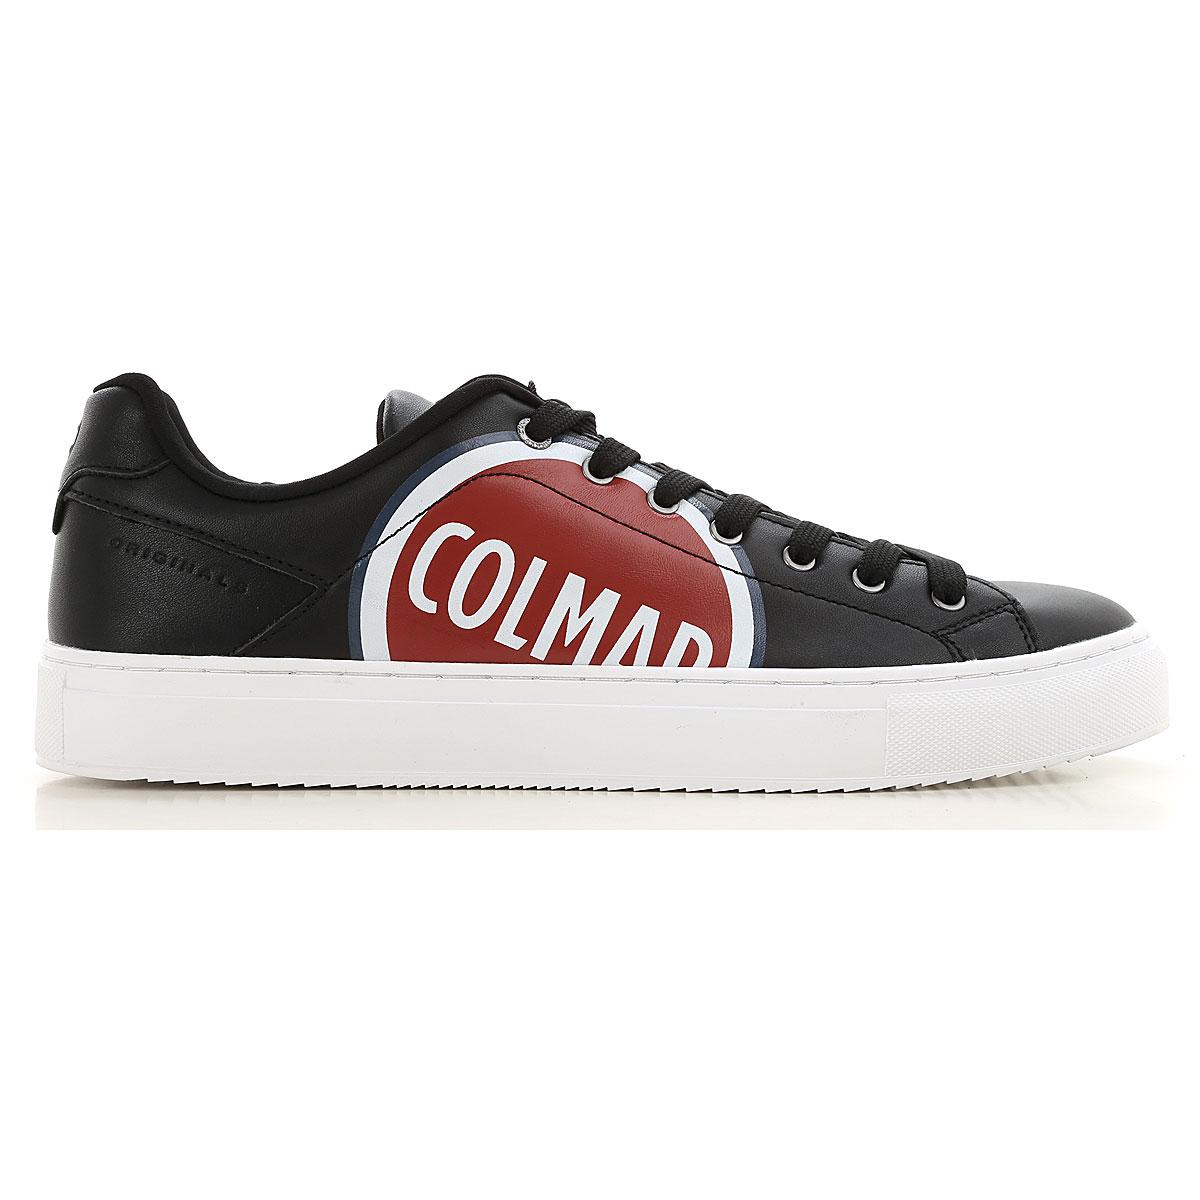 Scarpe Uomo Sneakers Colmar Offerte Limitate